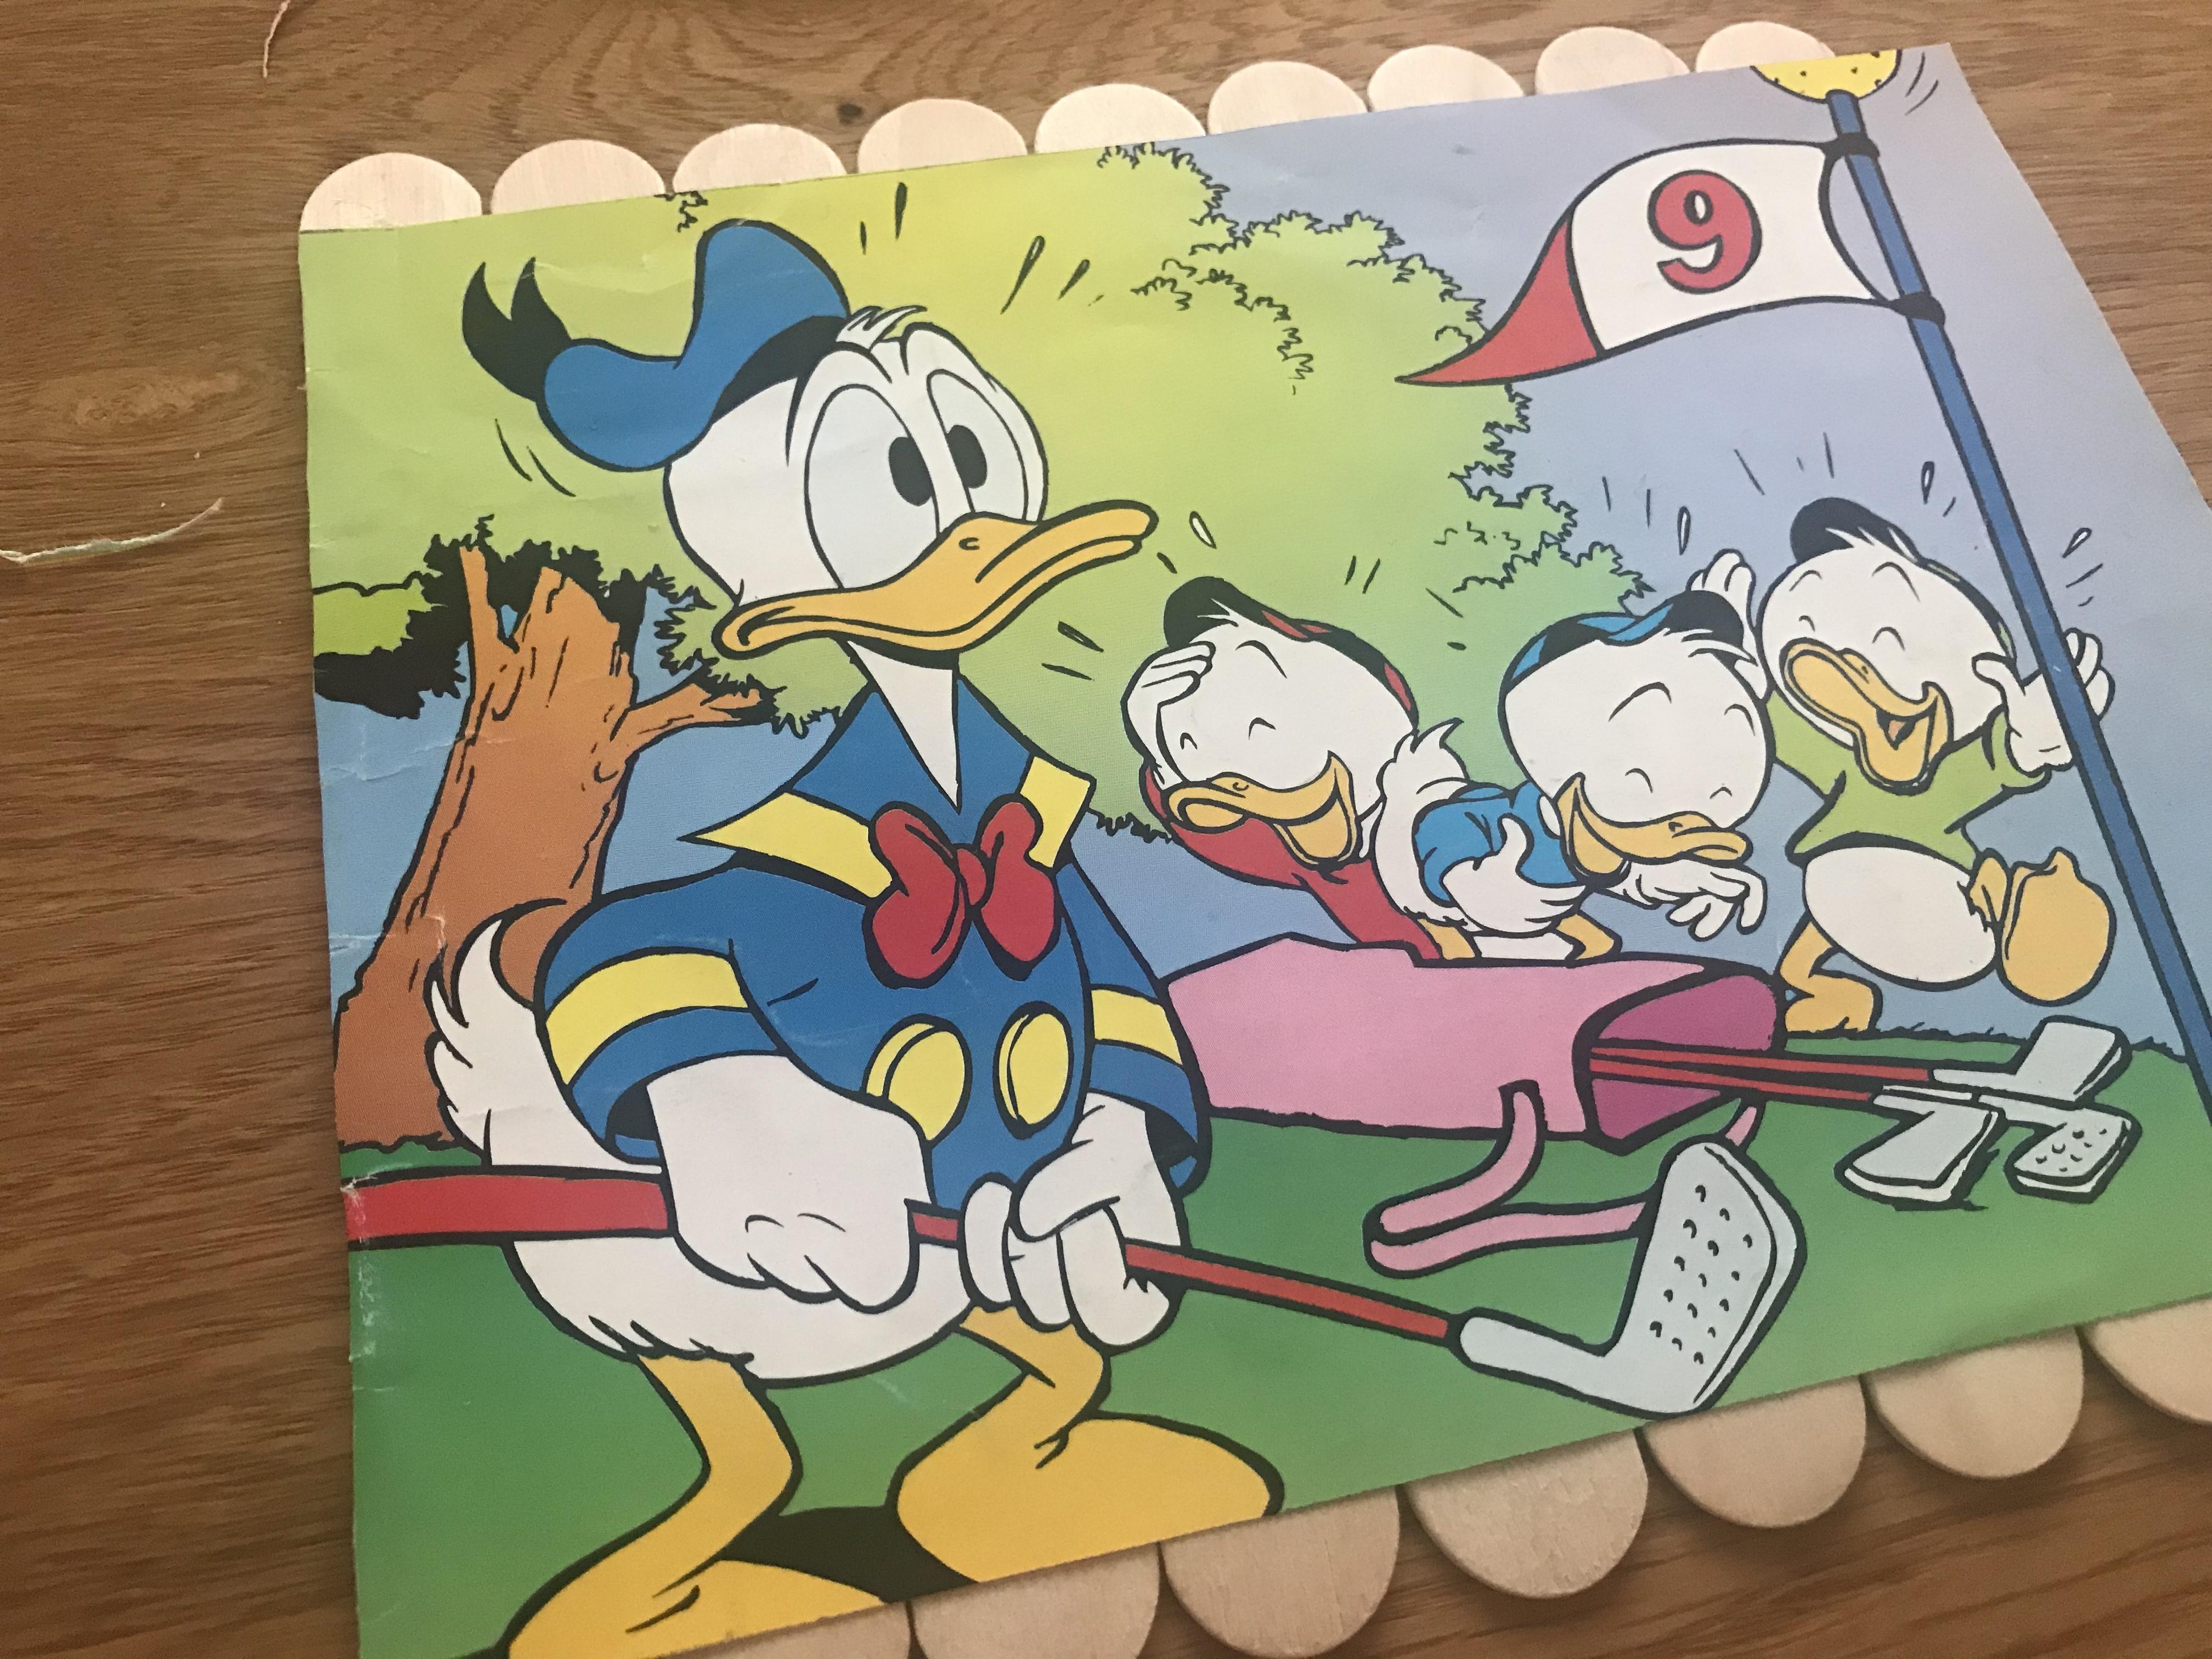 Kinderpuzzle aus Mundspatel